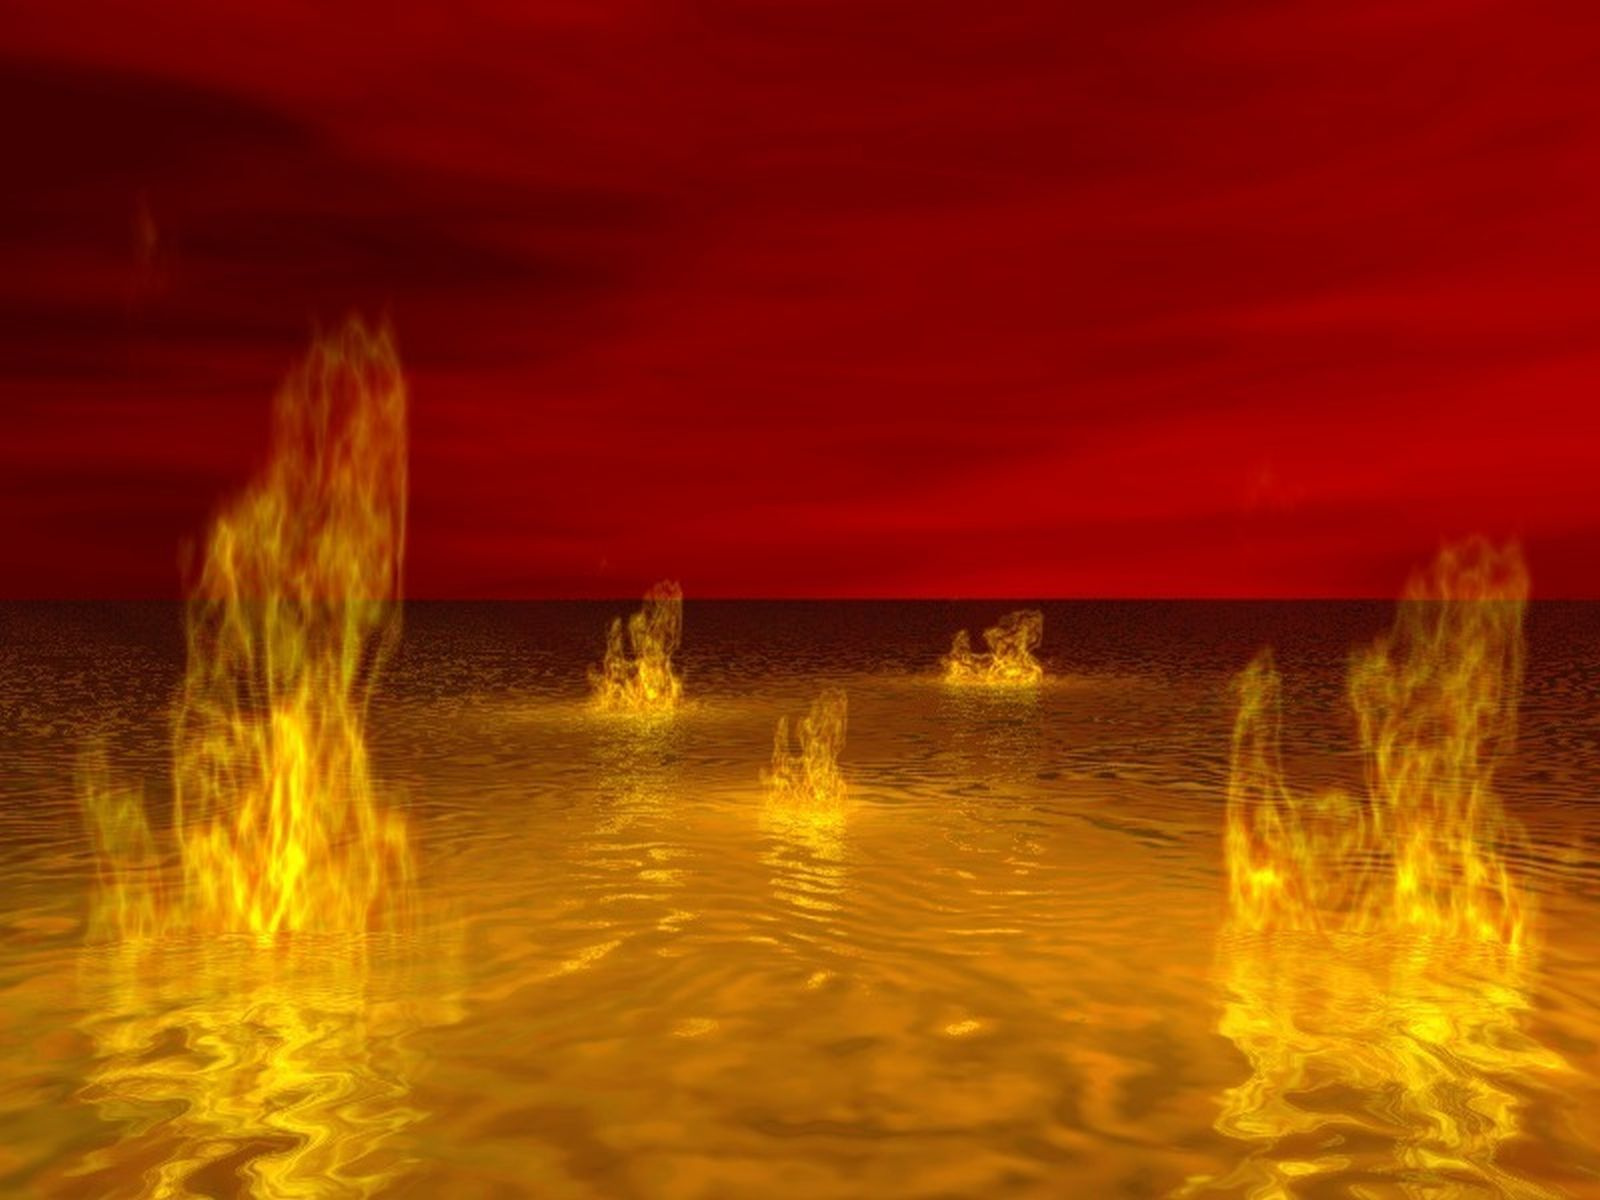 Popular Wallpaper Fire Gold - d0cf3828def4a208c95b4904f78ef908  Best Photo Reference_4590100 .jpg